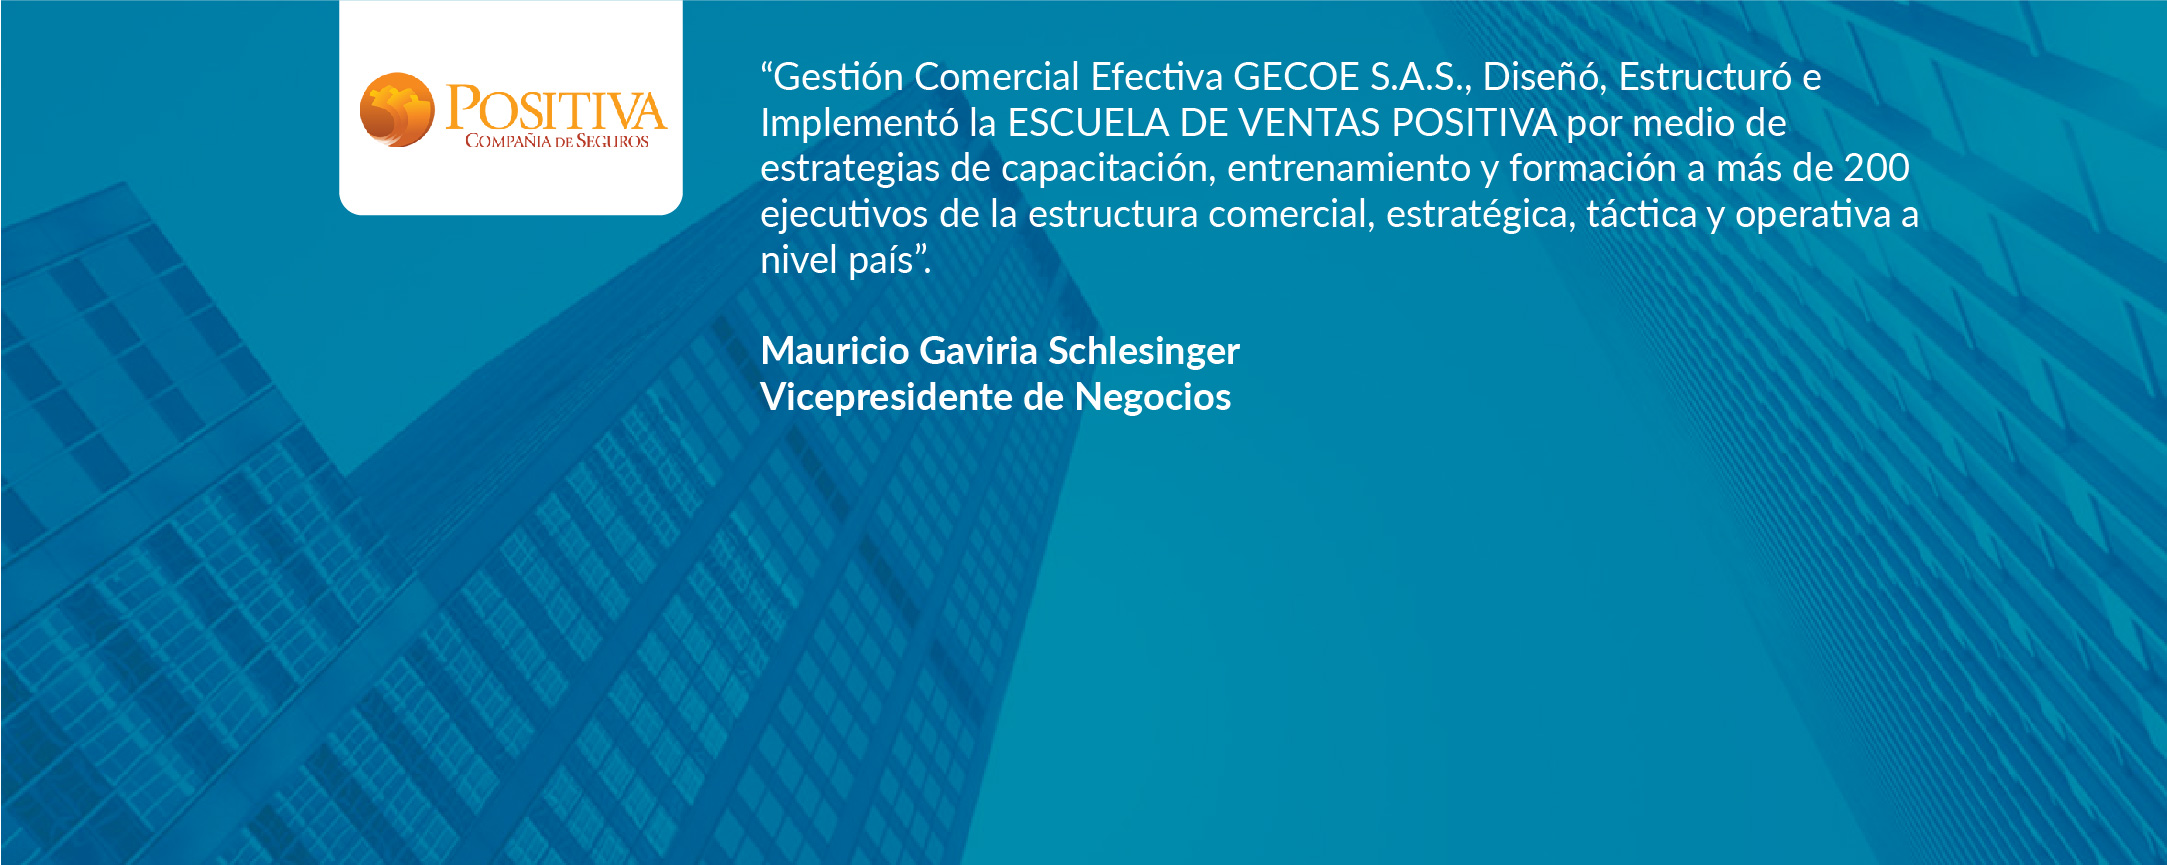 http://gecoe.com.co/wp-content/uploads/2016/09/testimonial-POSITIVA-09.jpg